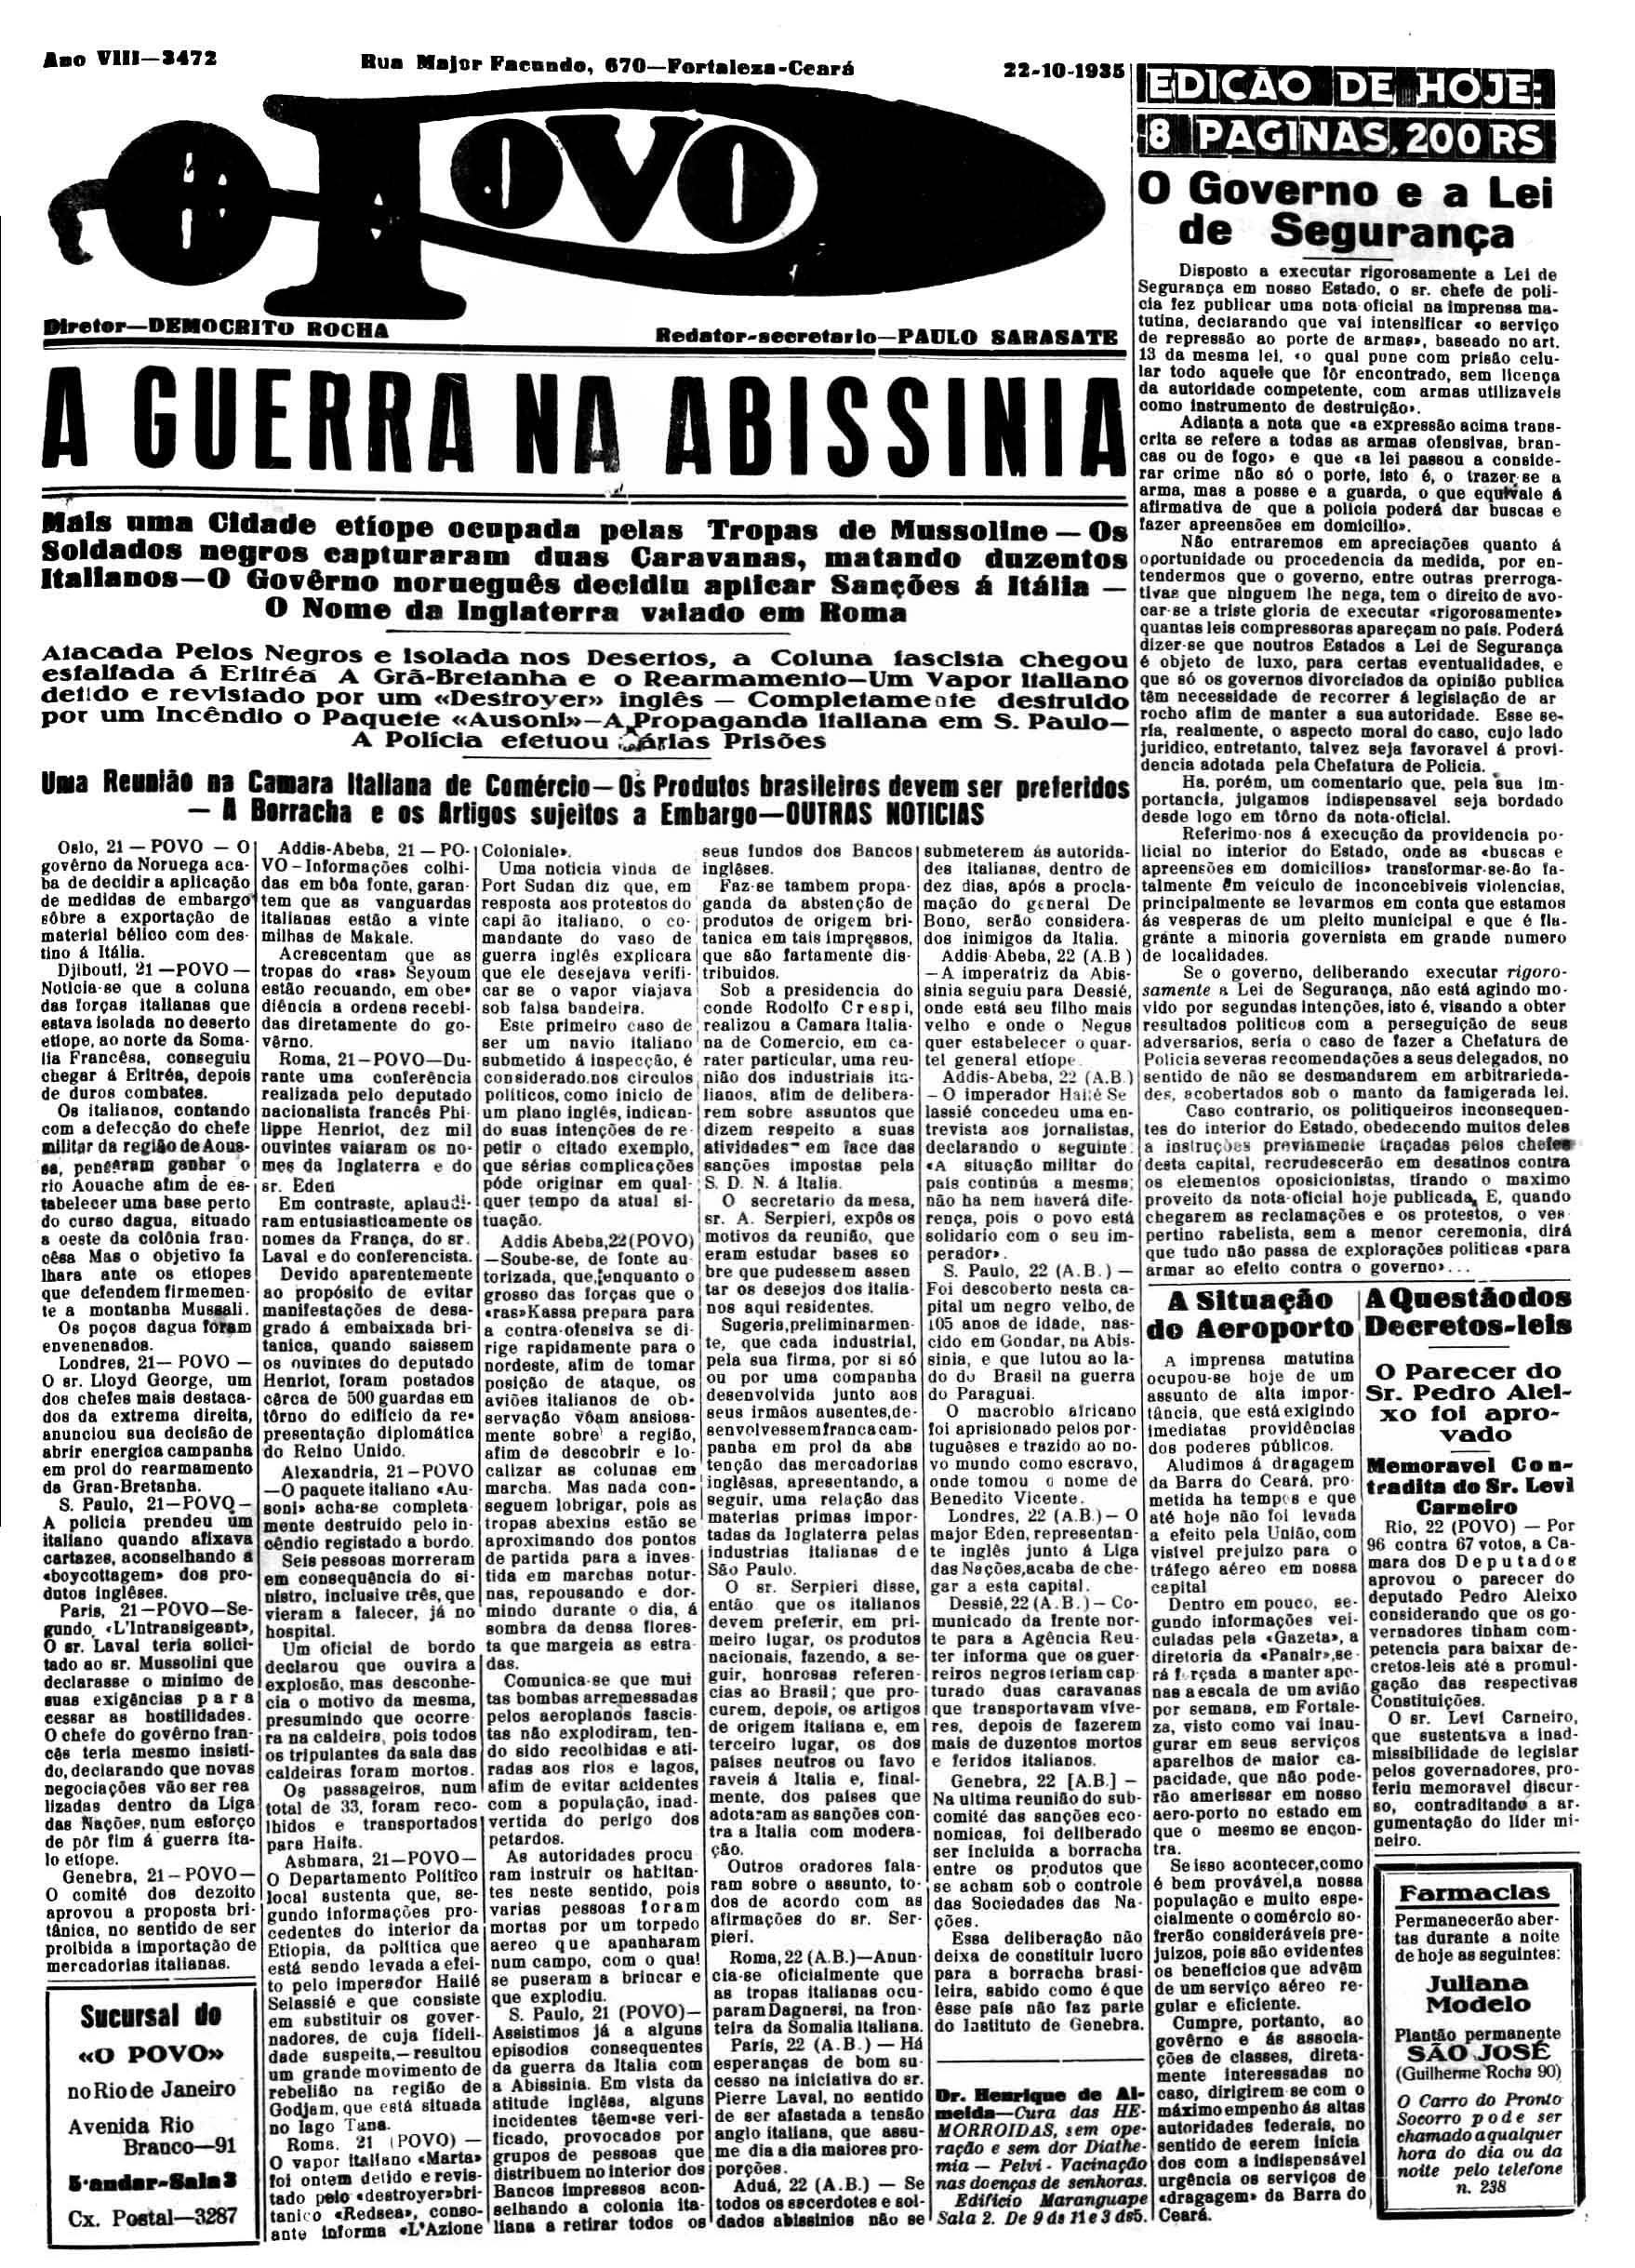 22-10-1935